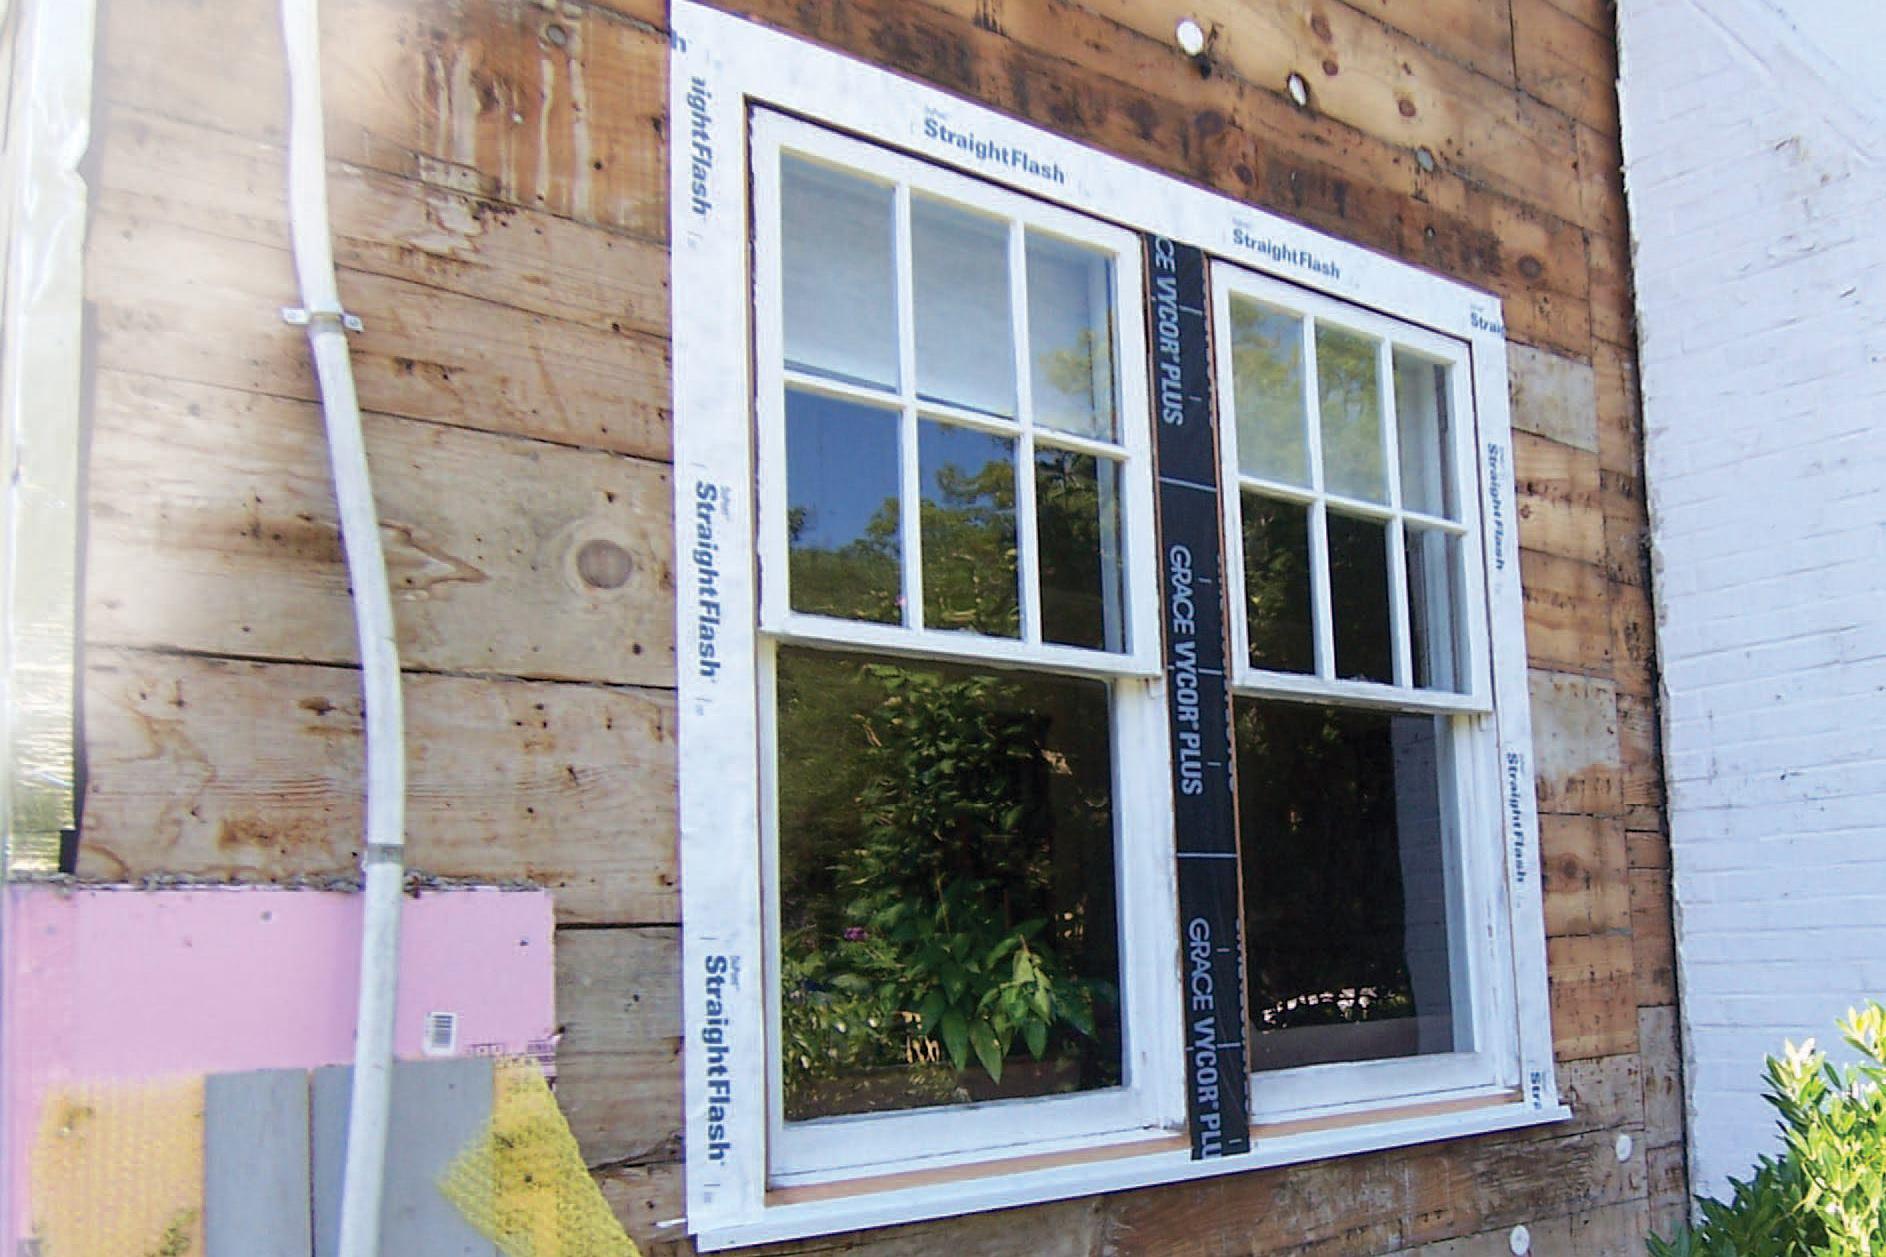 Built Out Trim For Exterior Foam Jlc Online Caulks Adhesives And Sealants Exteriors Insulation Building Envelope